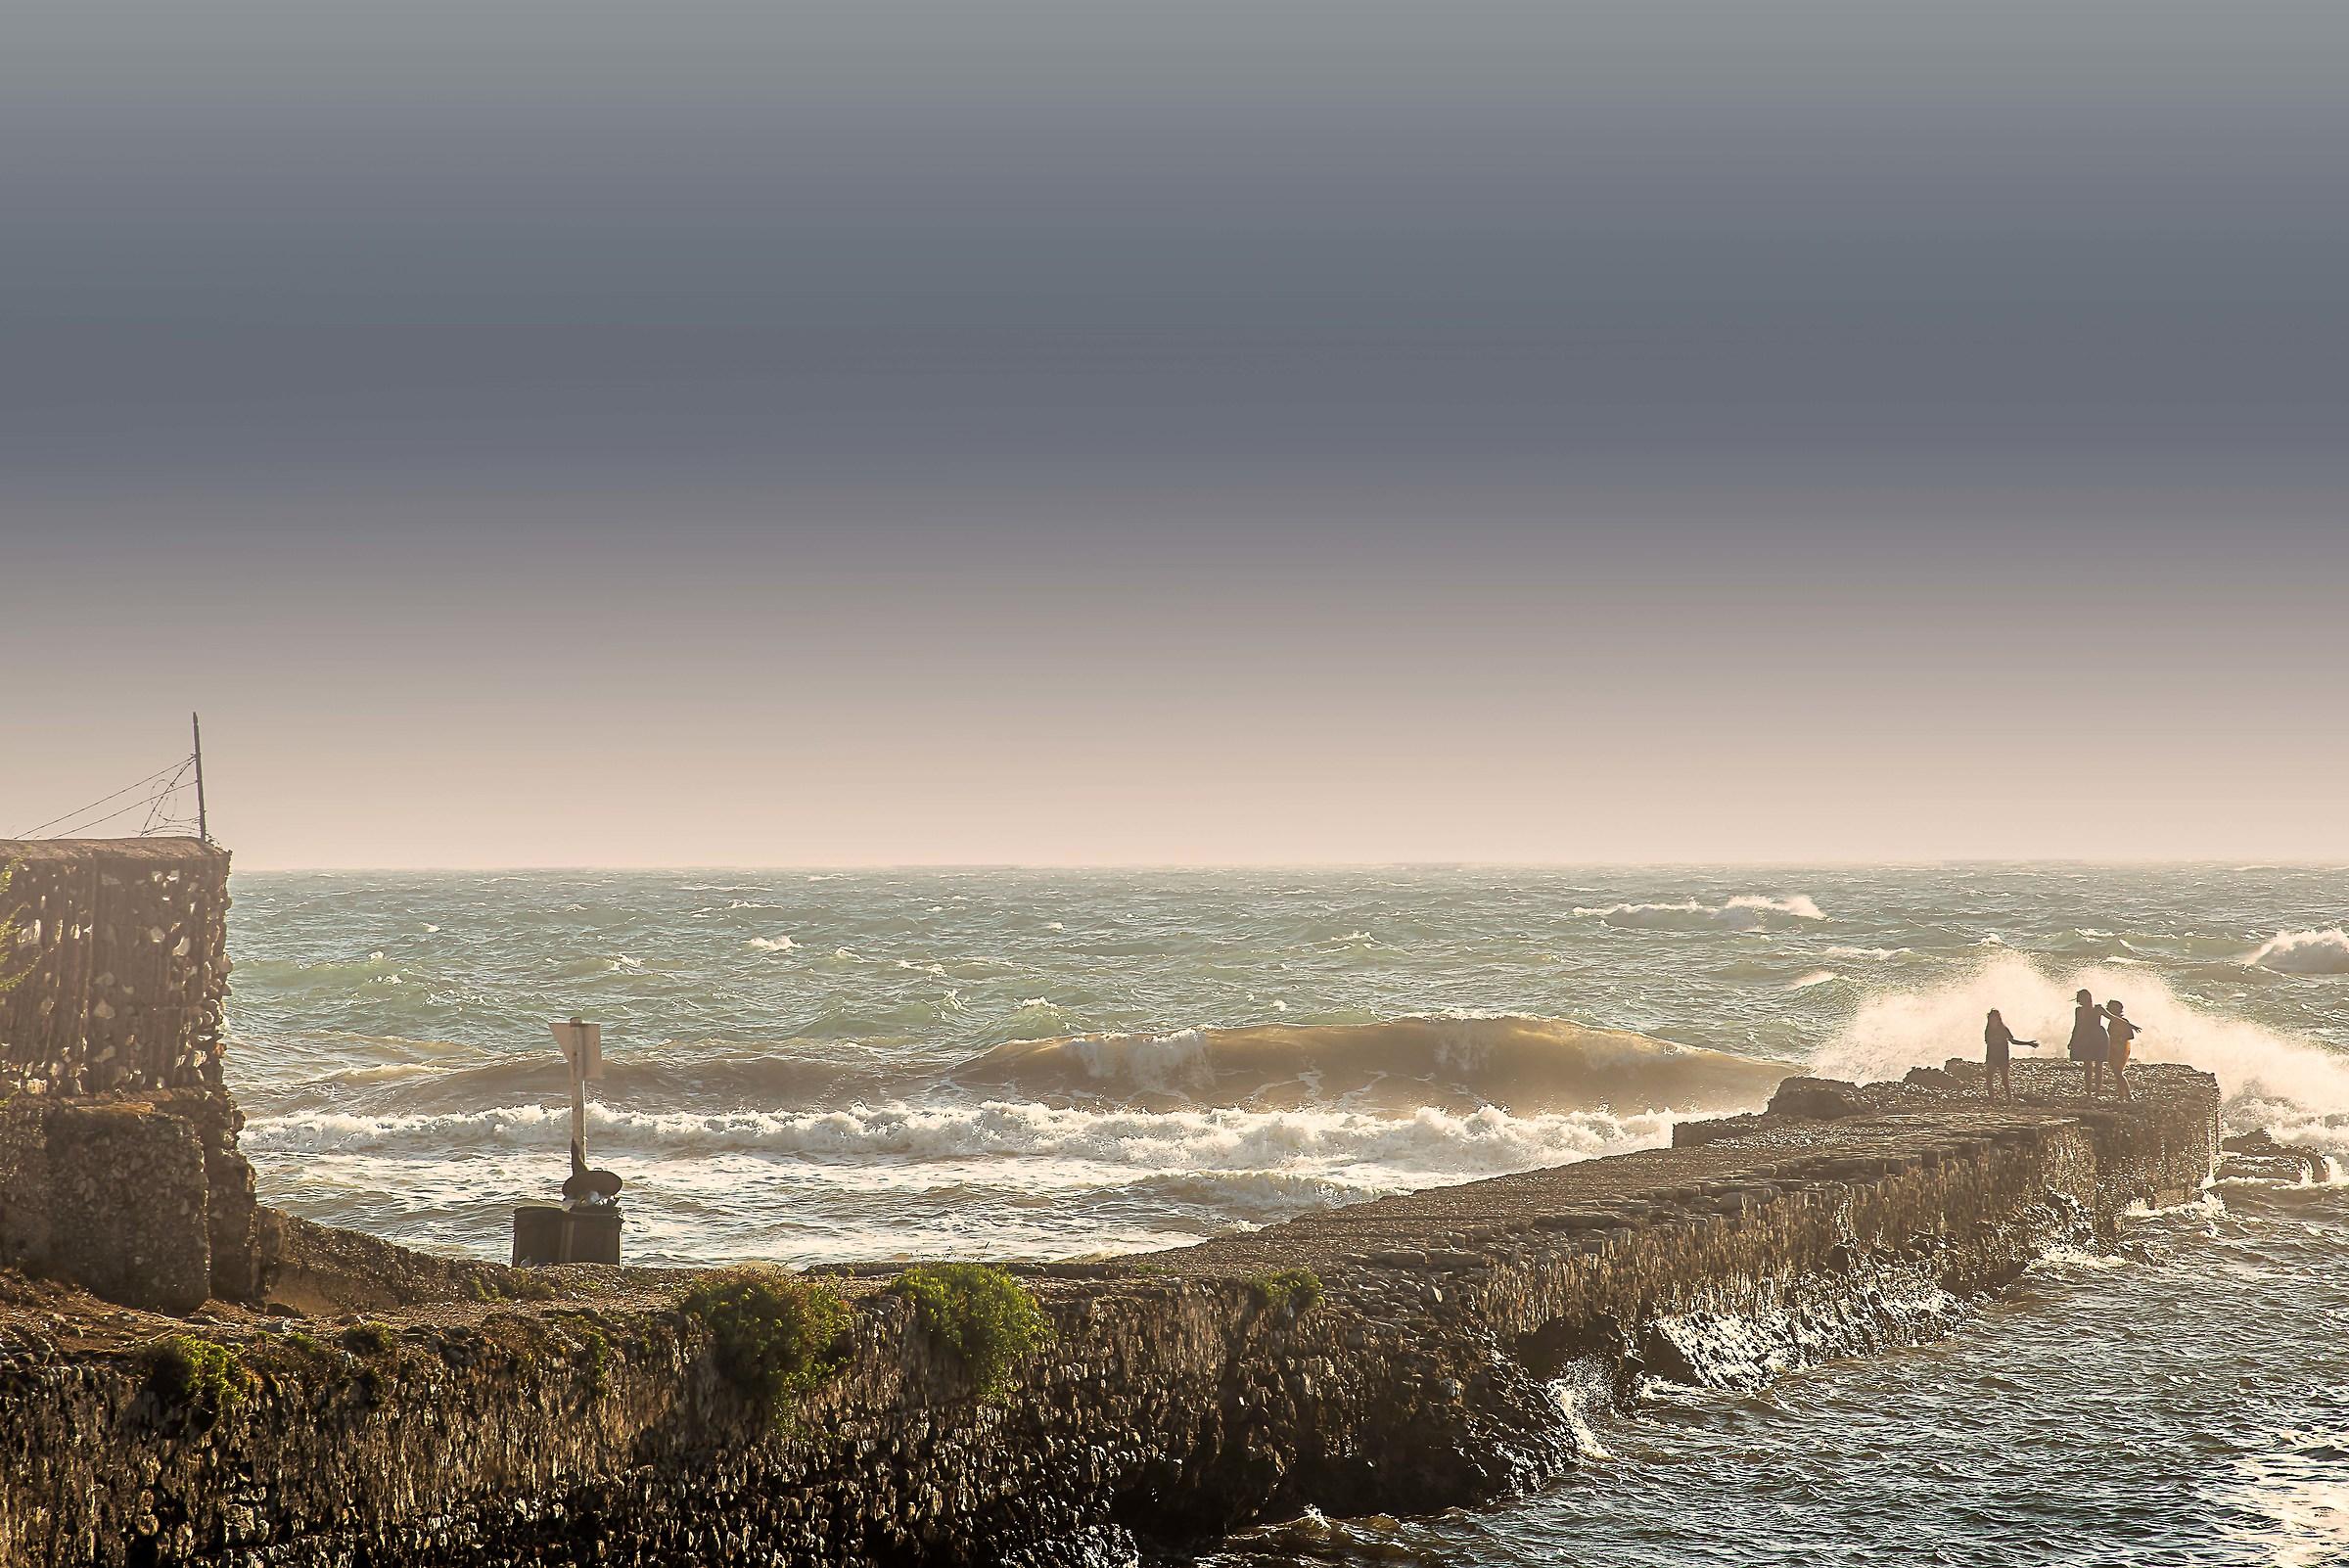 The coastline...